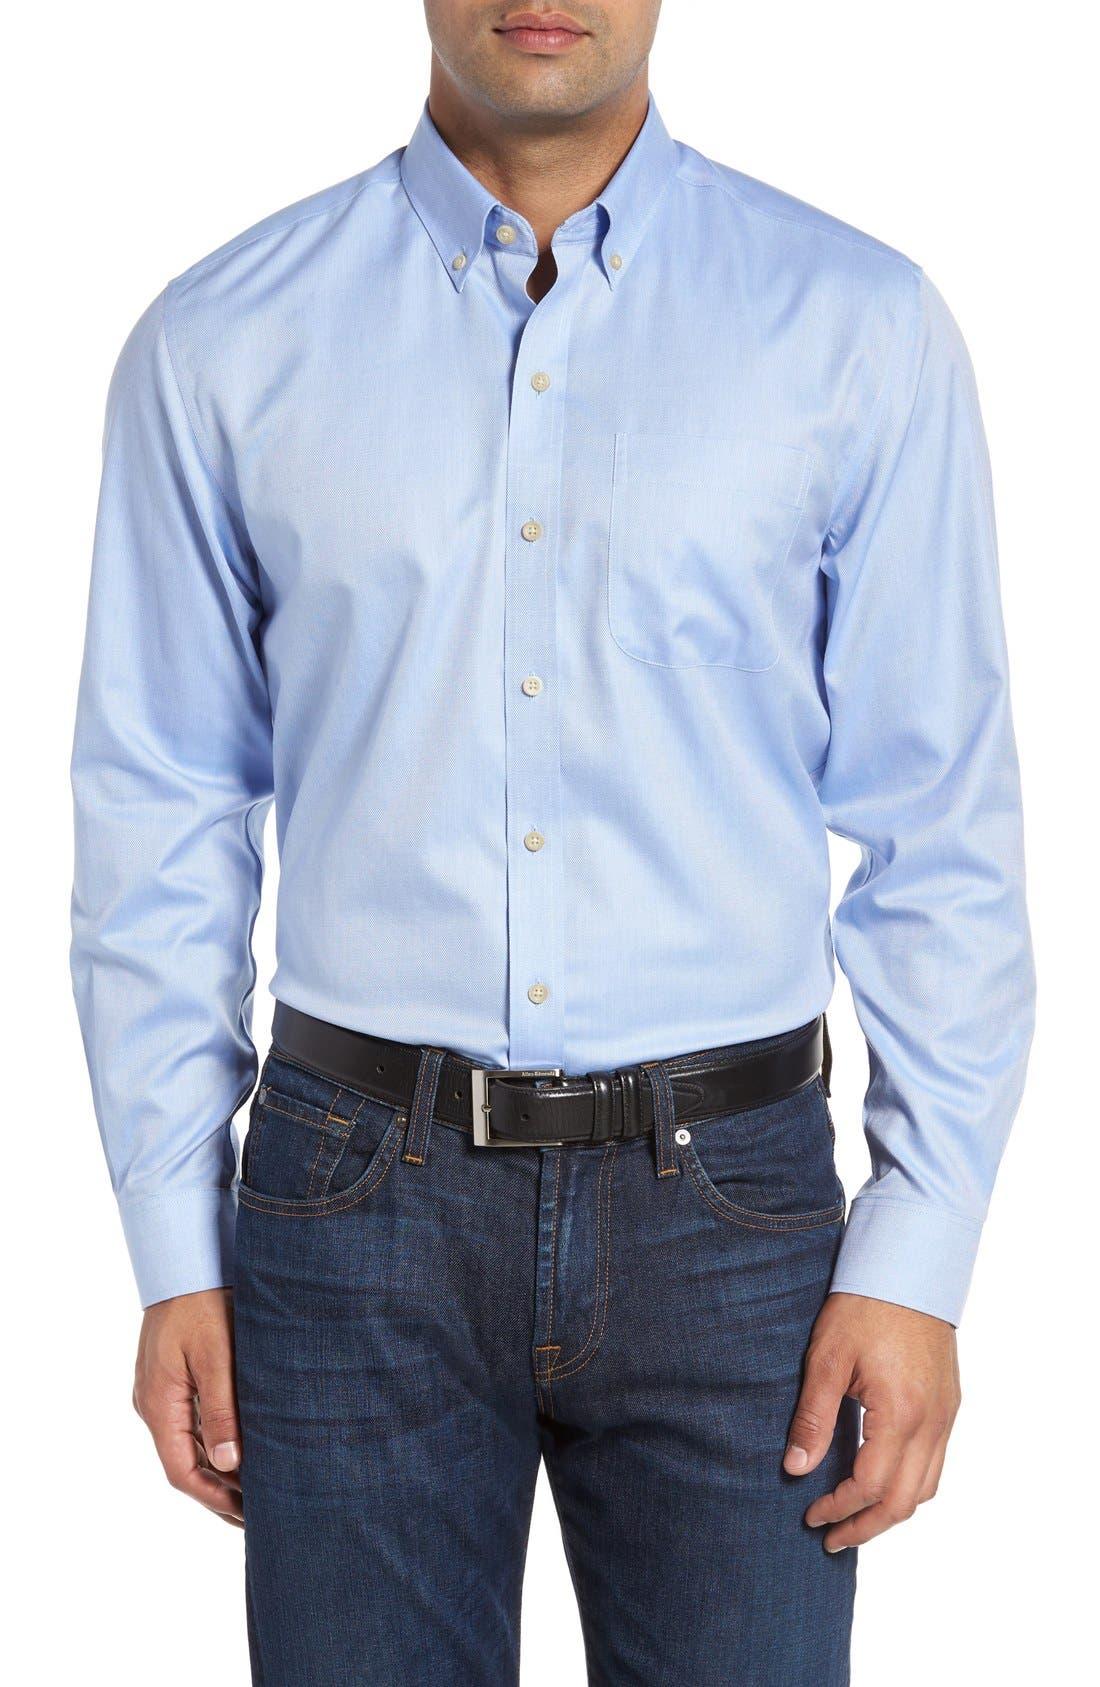 Cutter & Buck San Juan Classic Fit Wrinkle Free Solid Sport Shirt